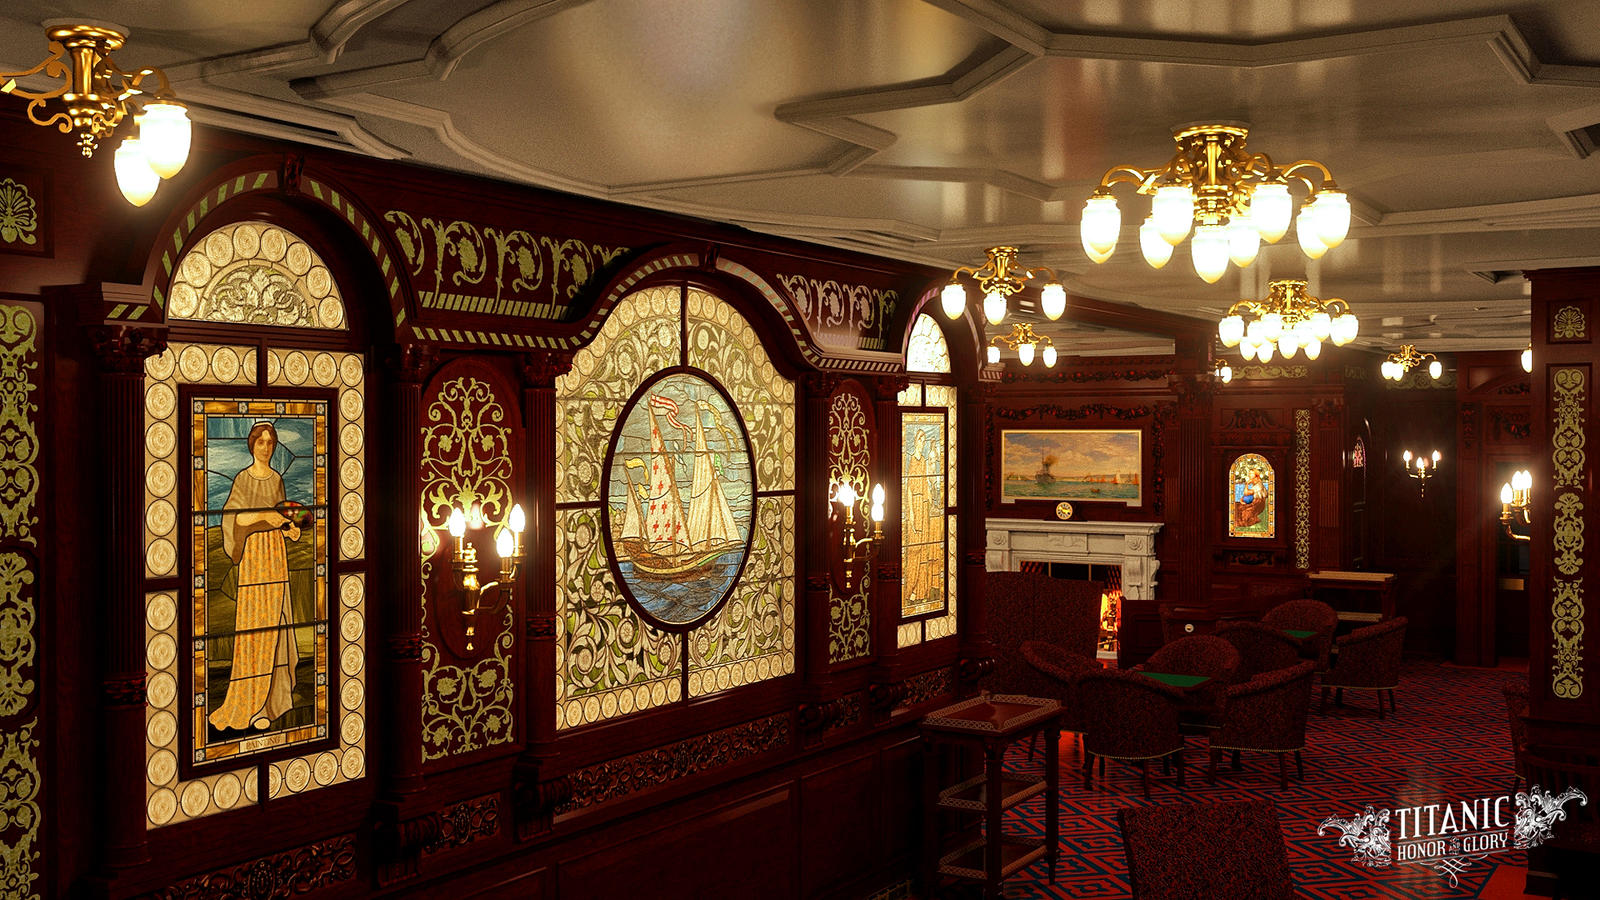 Titanic S First Class Smoke Room By Titanichonorandglory